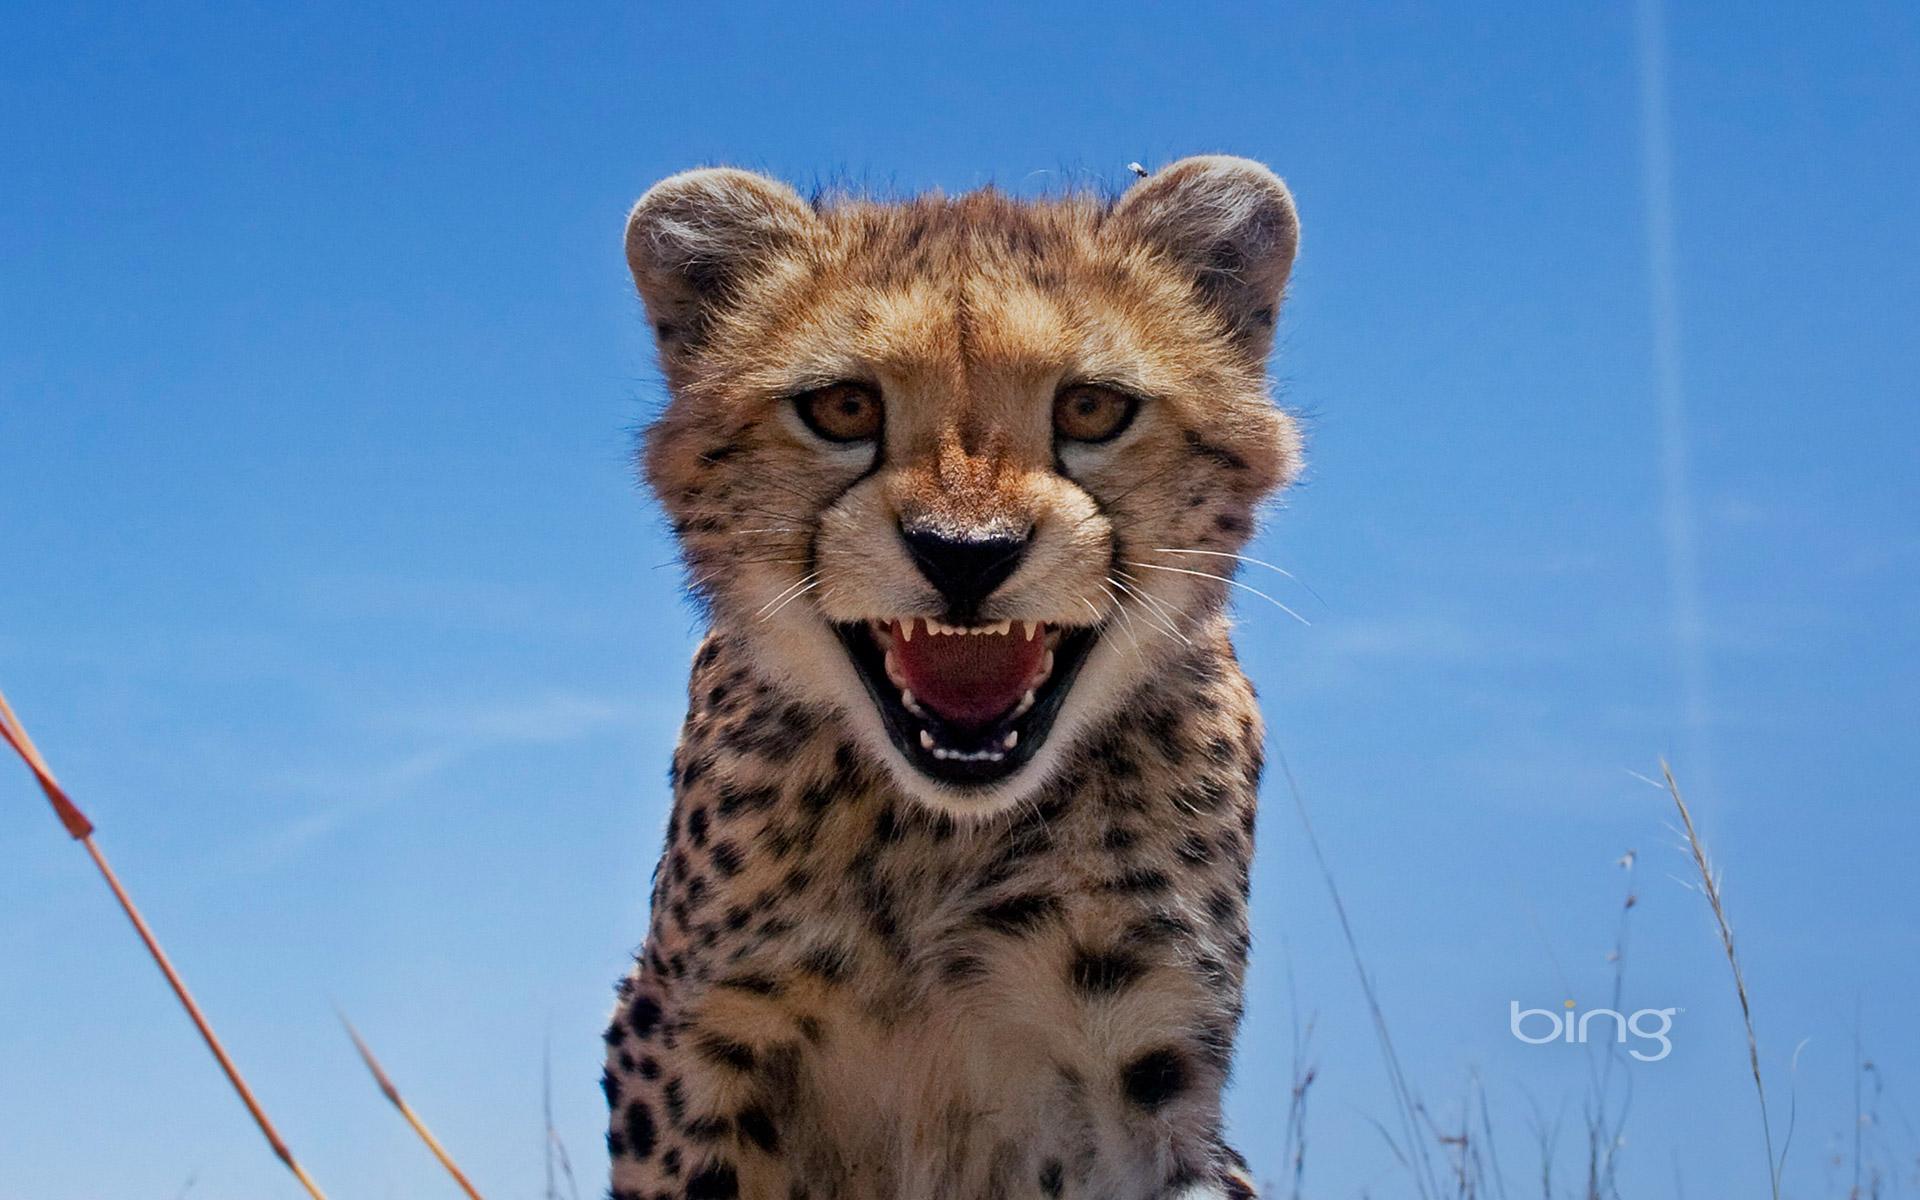 Wallpaper Cheetah Pair Hd Animals 6057: Cheetah Full HD Wallpaper And Background Image